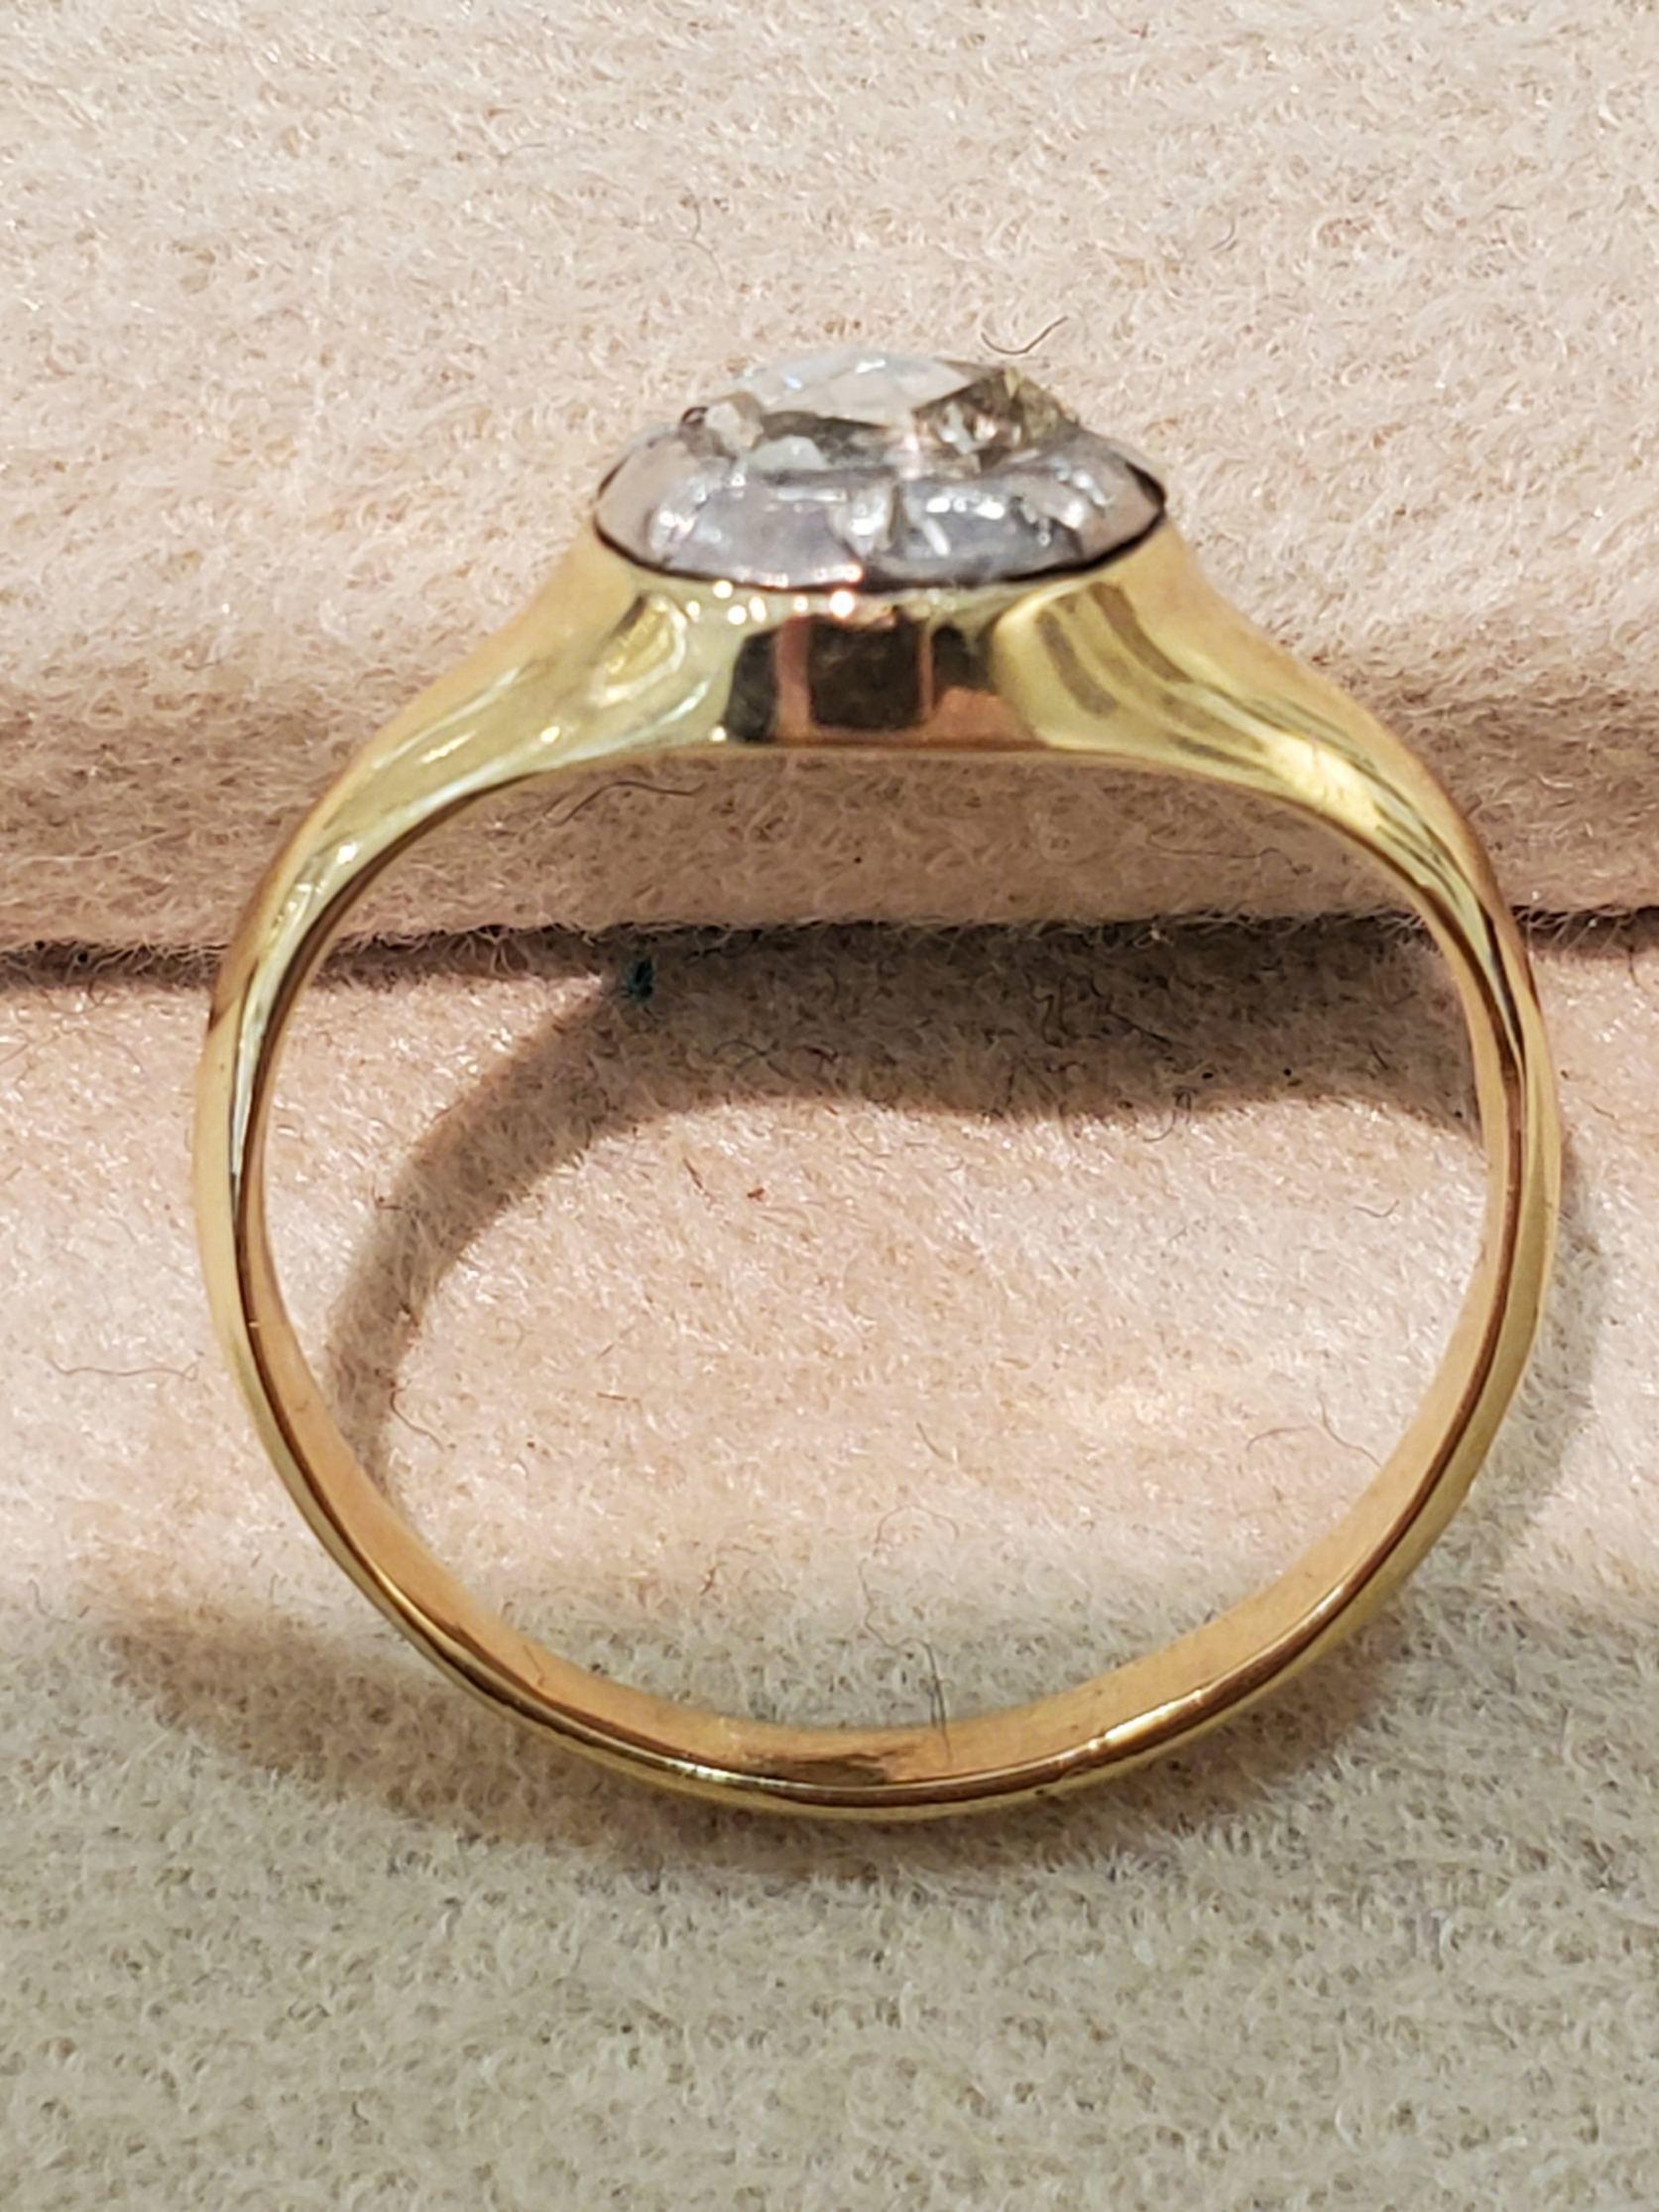 Gold.Sv.ローズカットダイヤモンドリング_b0284422_17461725.jpg